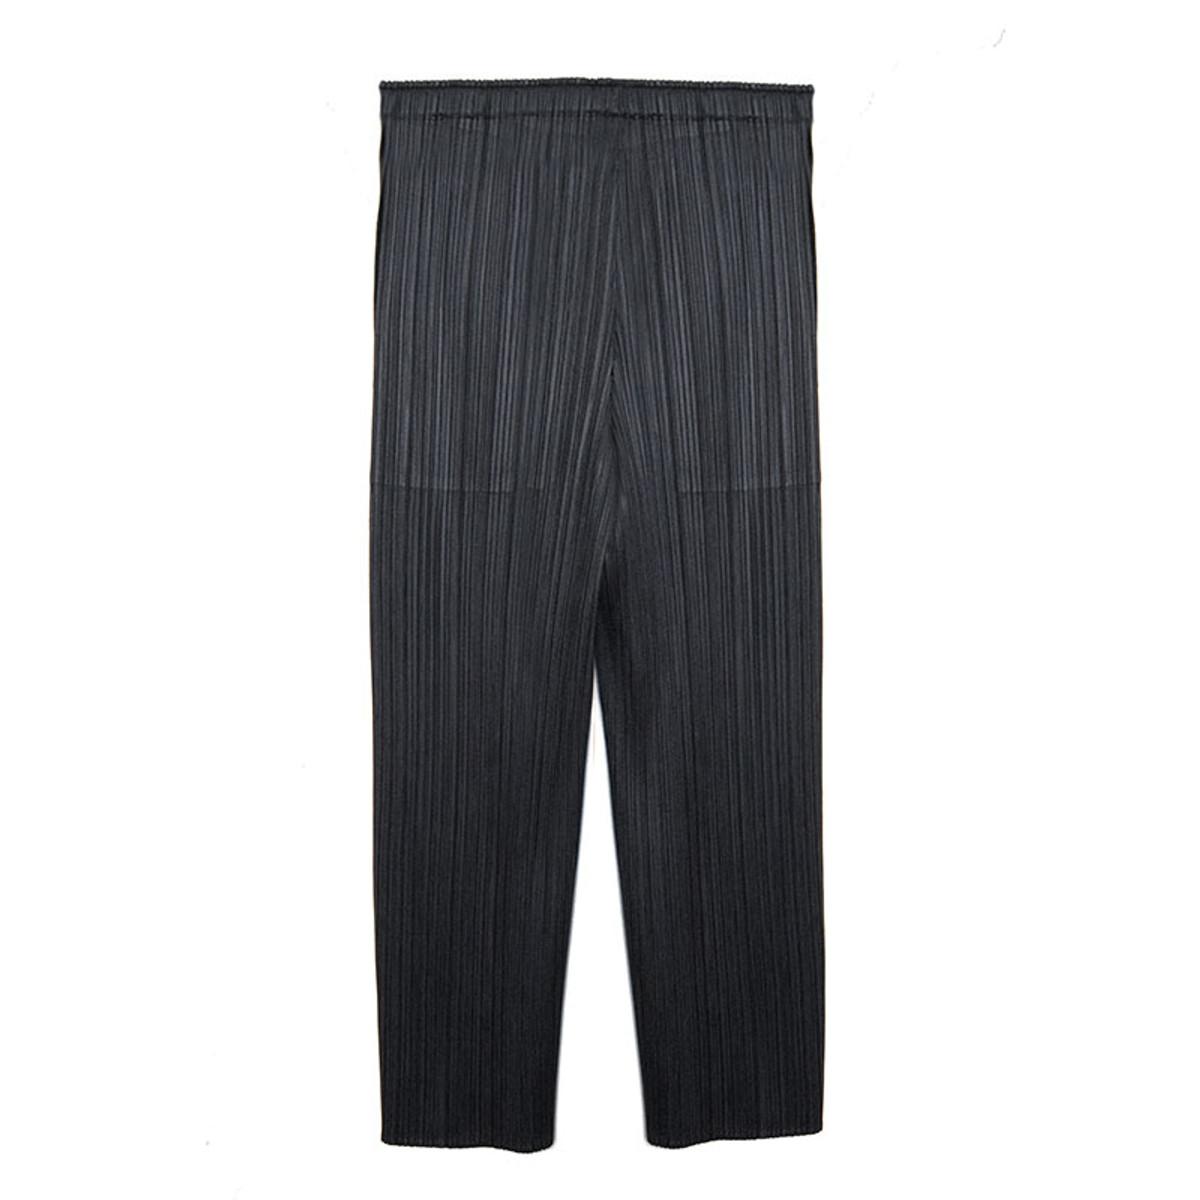 fe6ca82b8ef0 Pleats Please Issey Miyake Pleated Cropped Pants